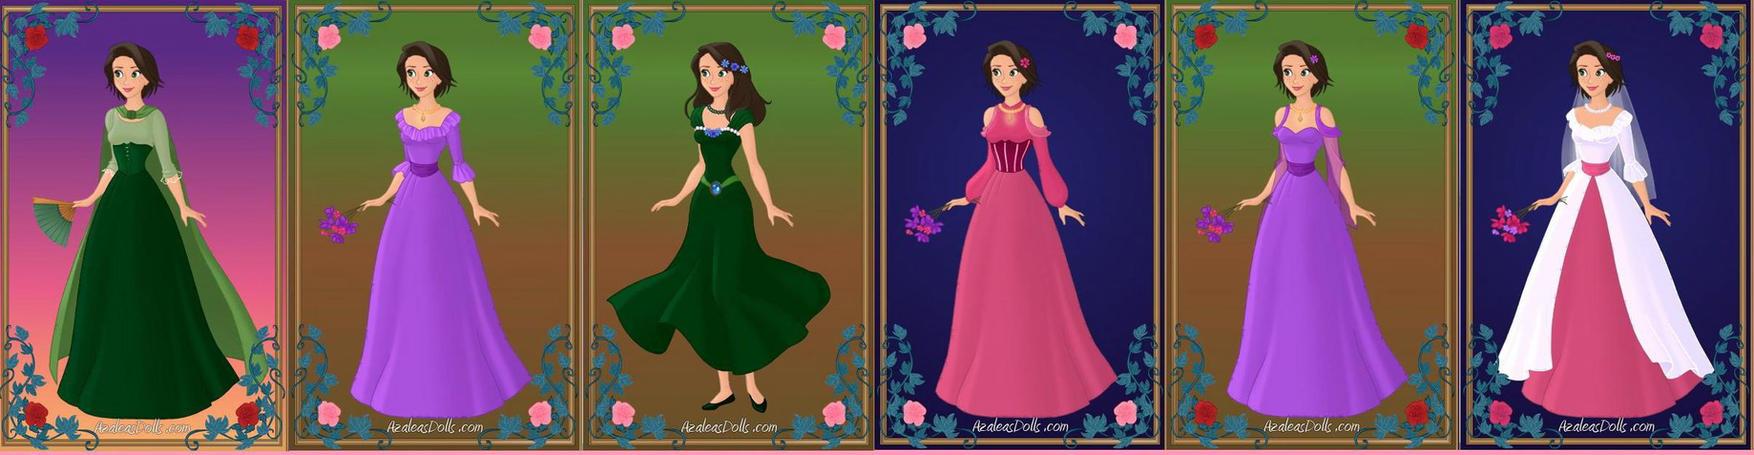 New Dress Designs for Rapunzel by ArielxJim08